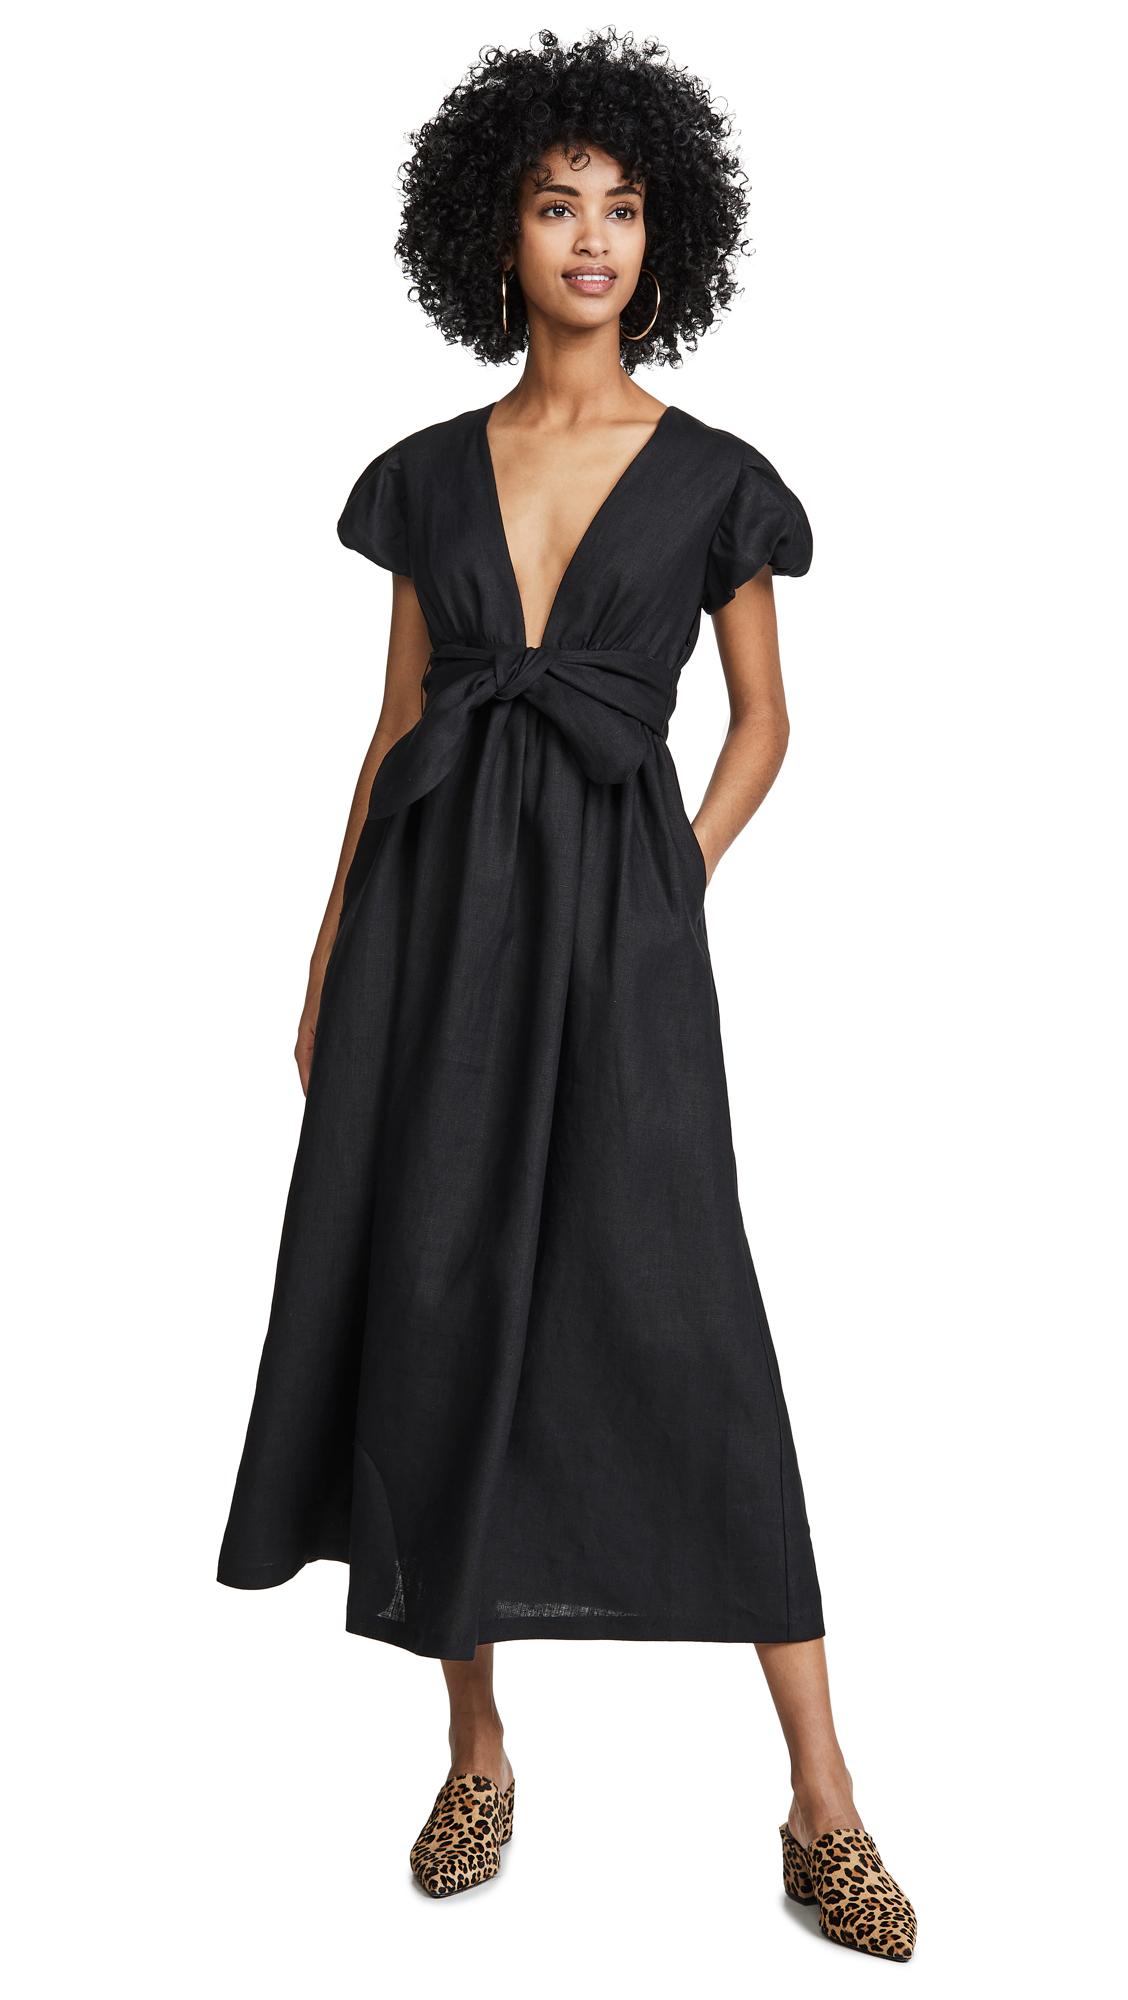 Mara Hoffman Savannah Dress - Black